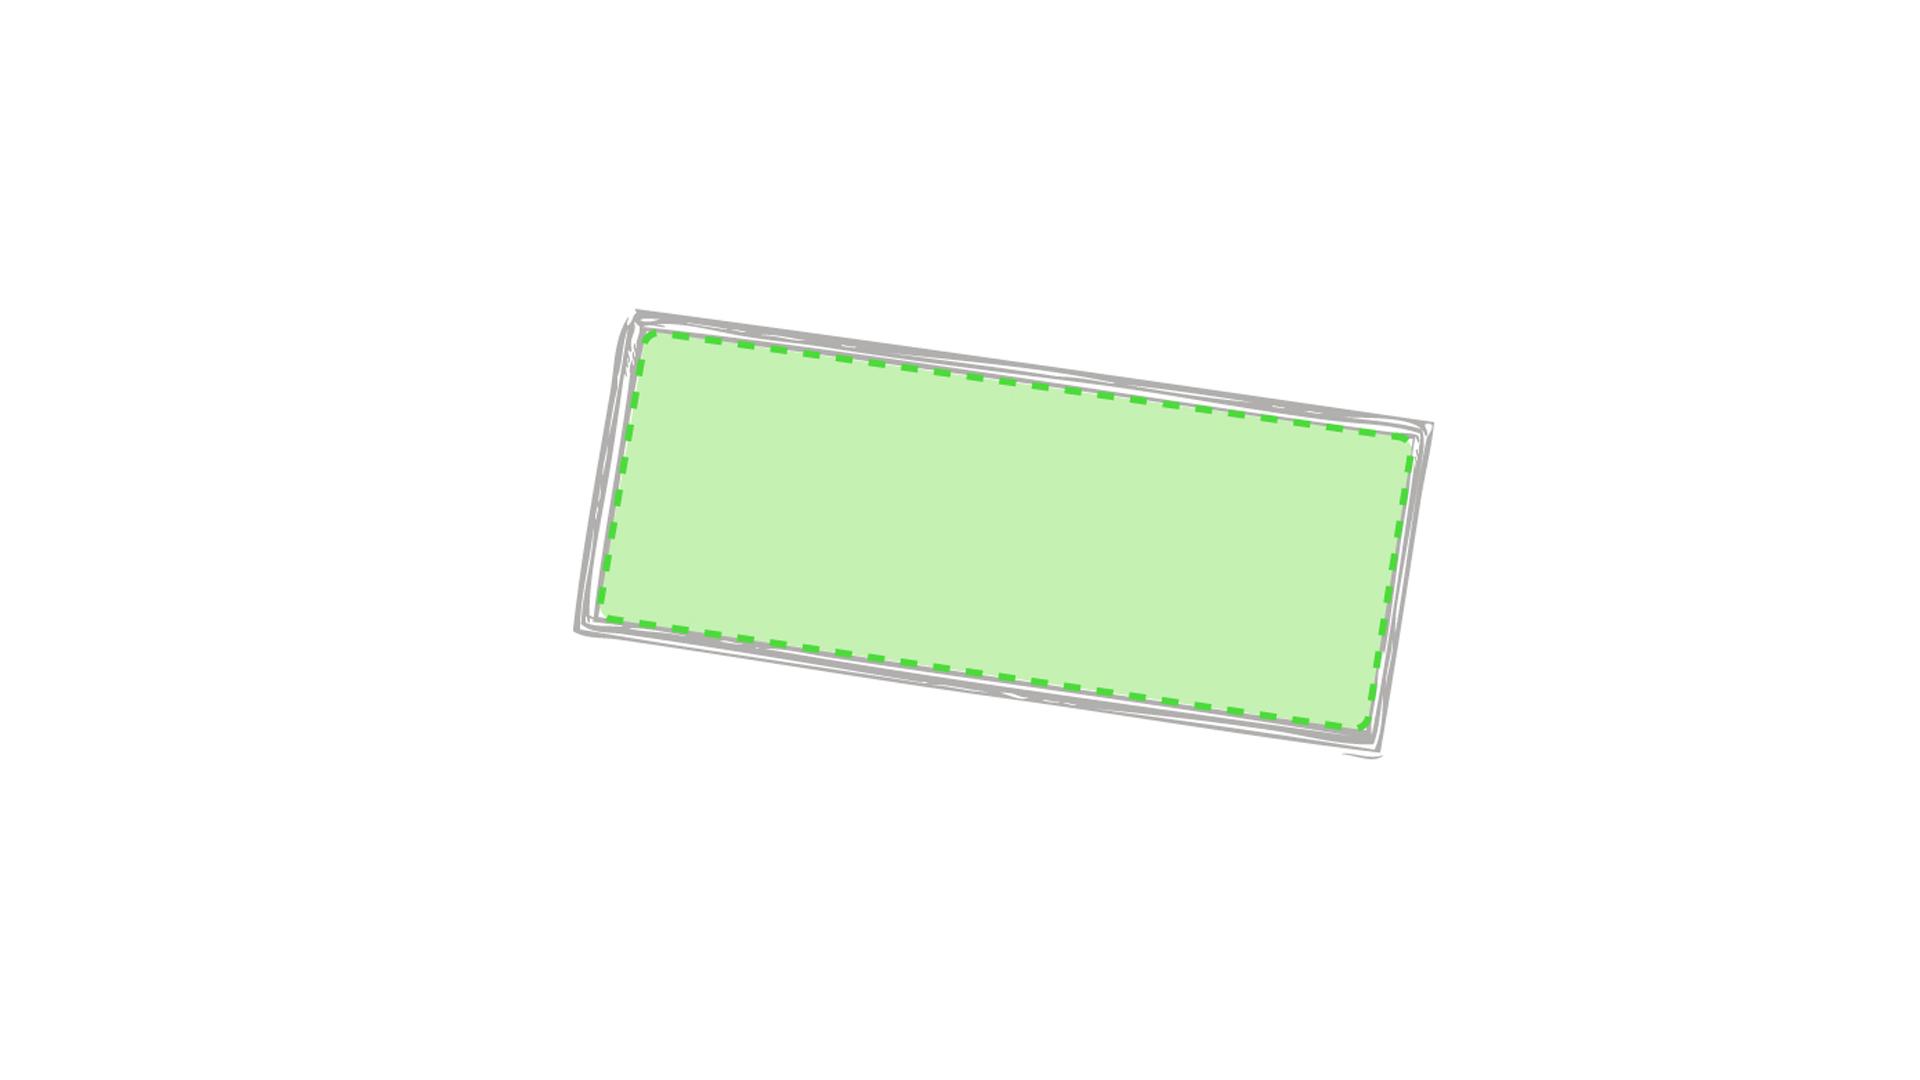 En el pin rectangular